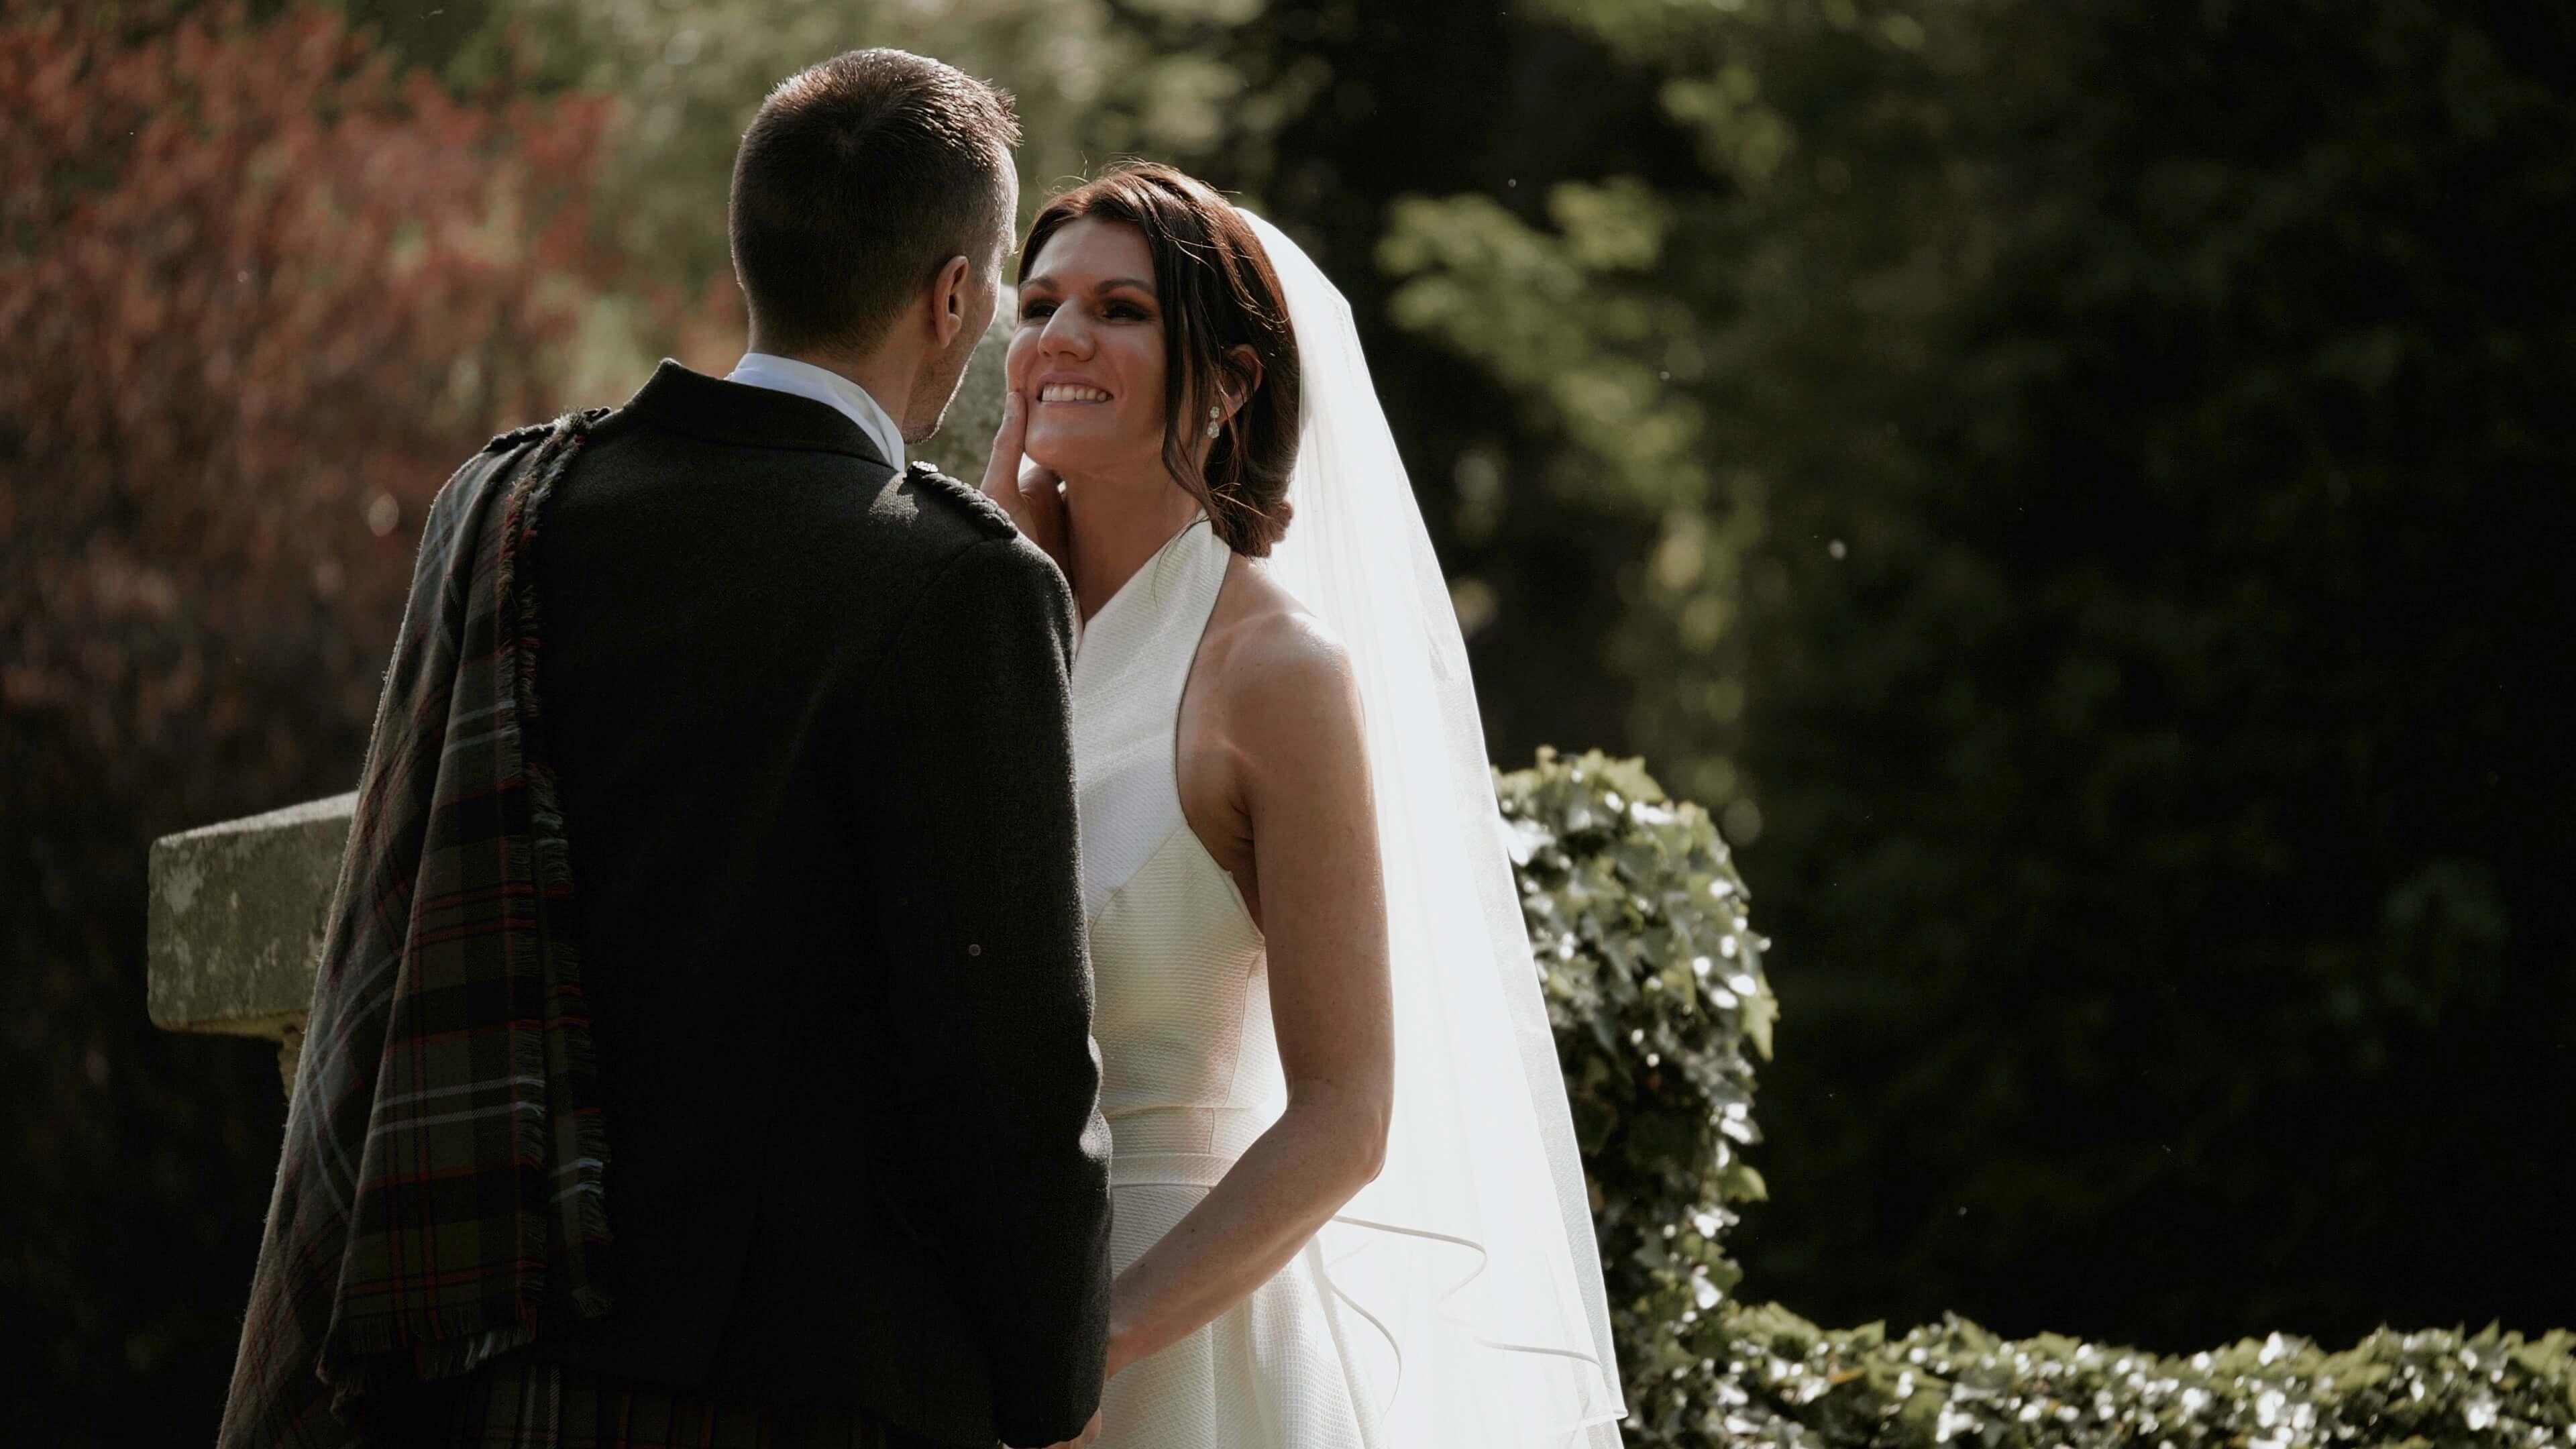 Roisin & Richard, Wedding Video at Waterford Castle